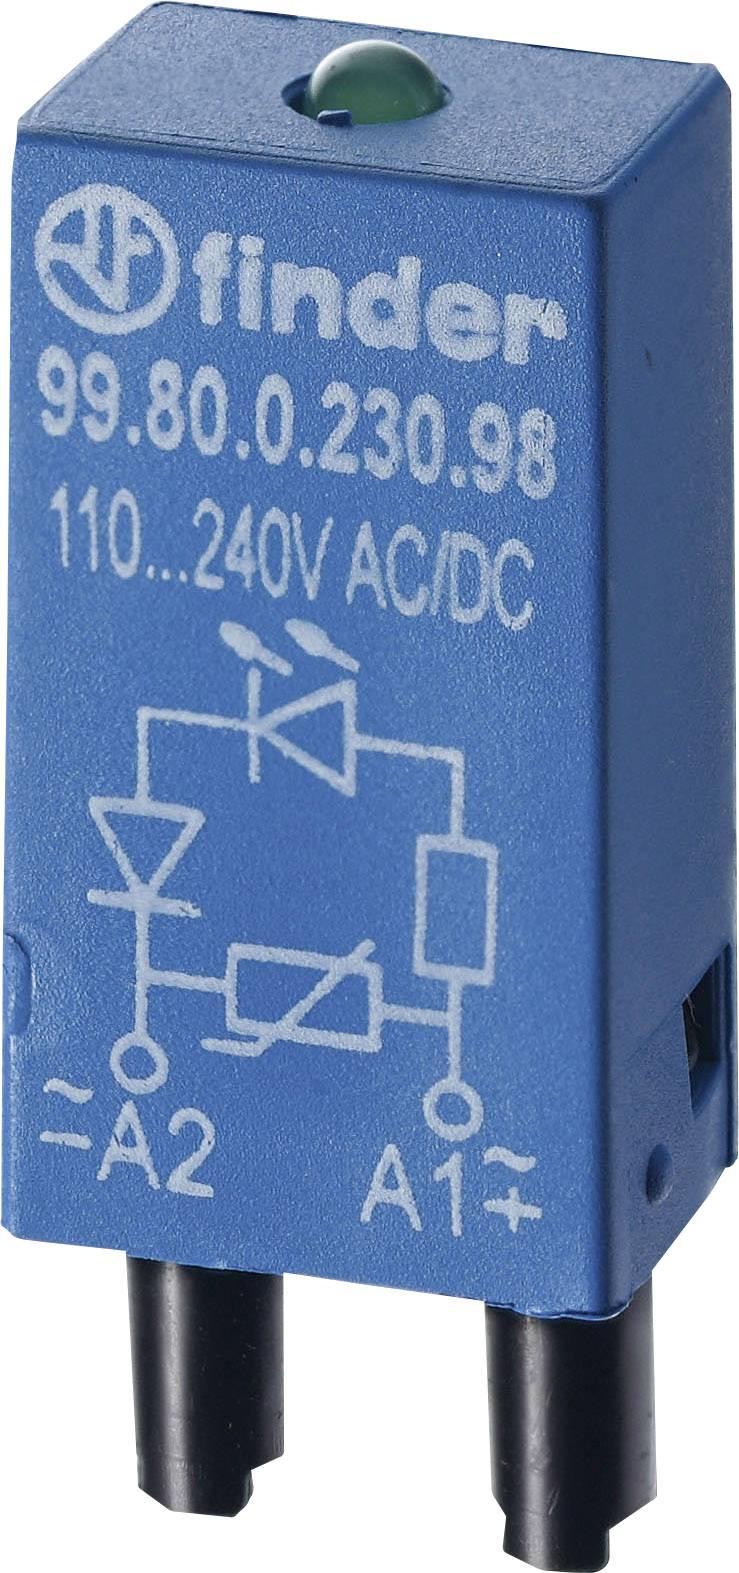 Zasúvací modul s diódou Finder 99.80.9.024.99 Farba svetla: zelená